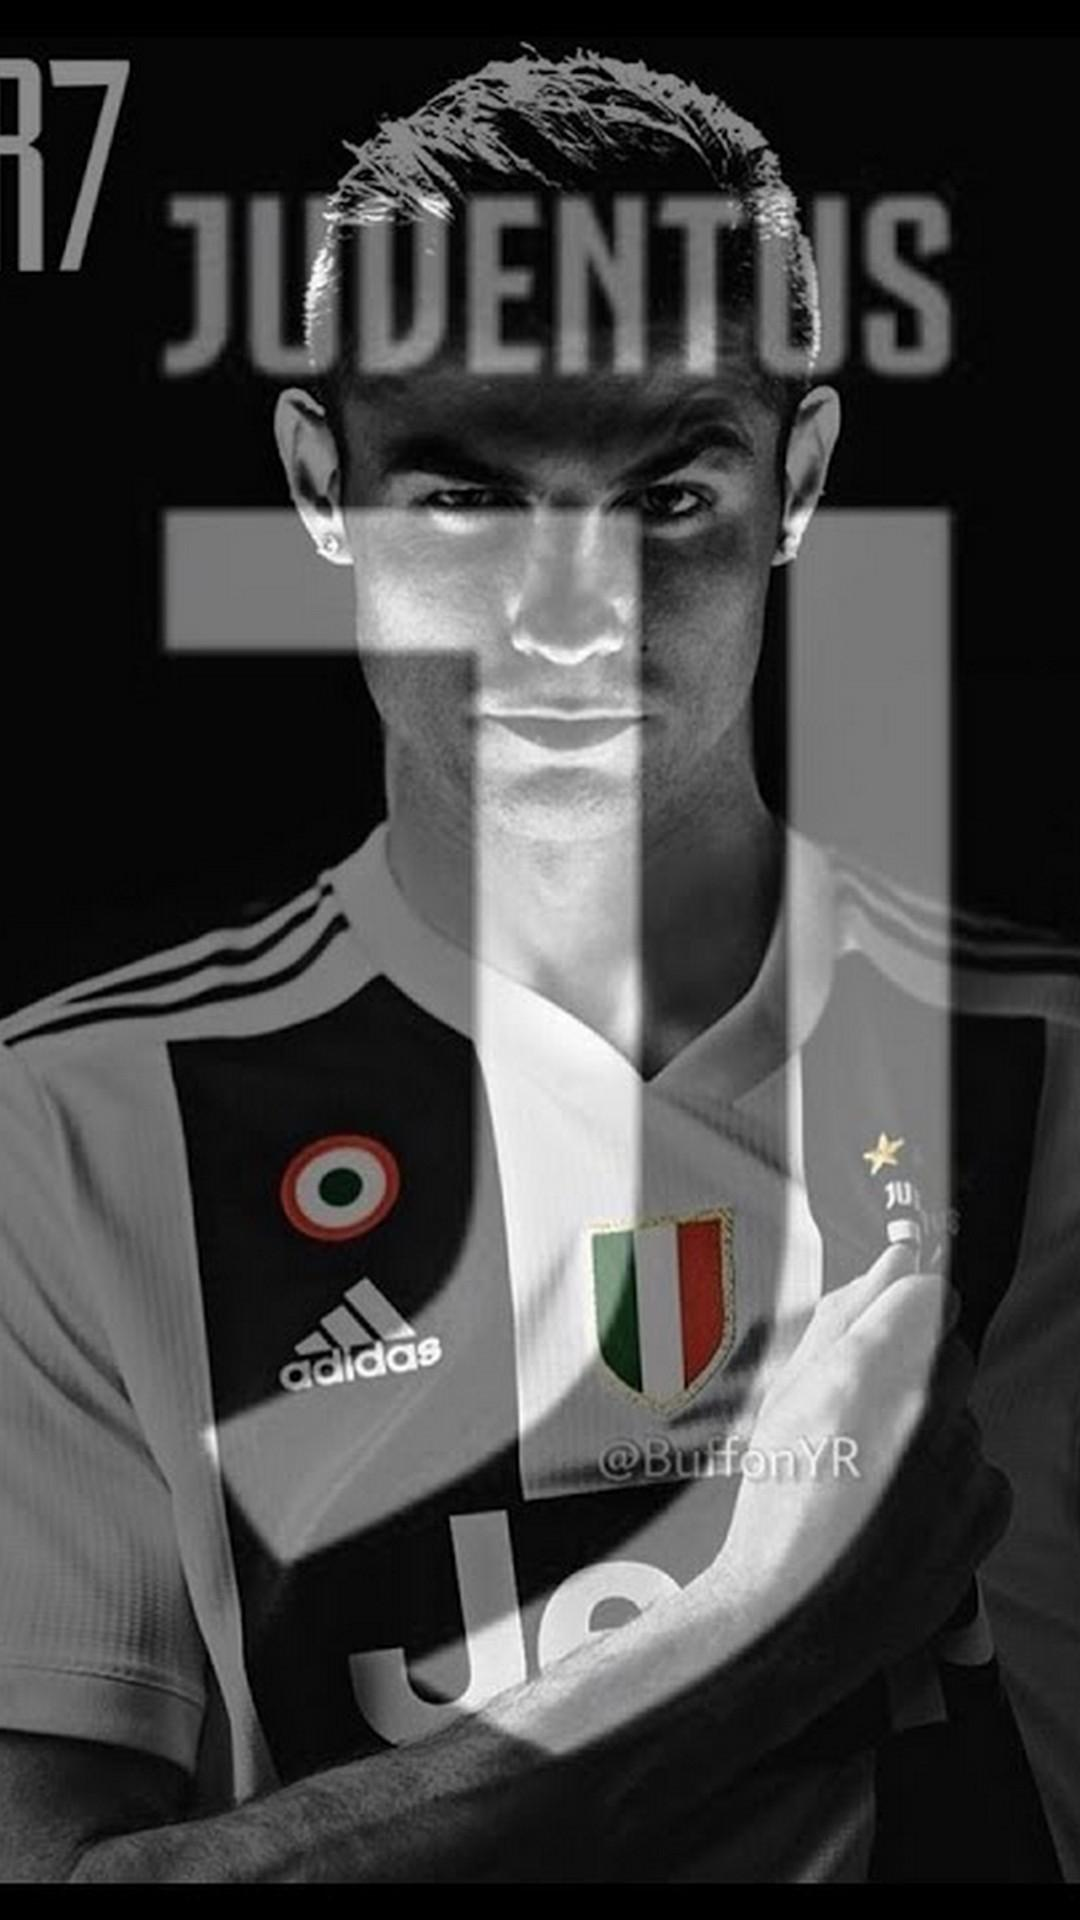 Juventus 2019 Wallpapers Wallpaper Cave